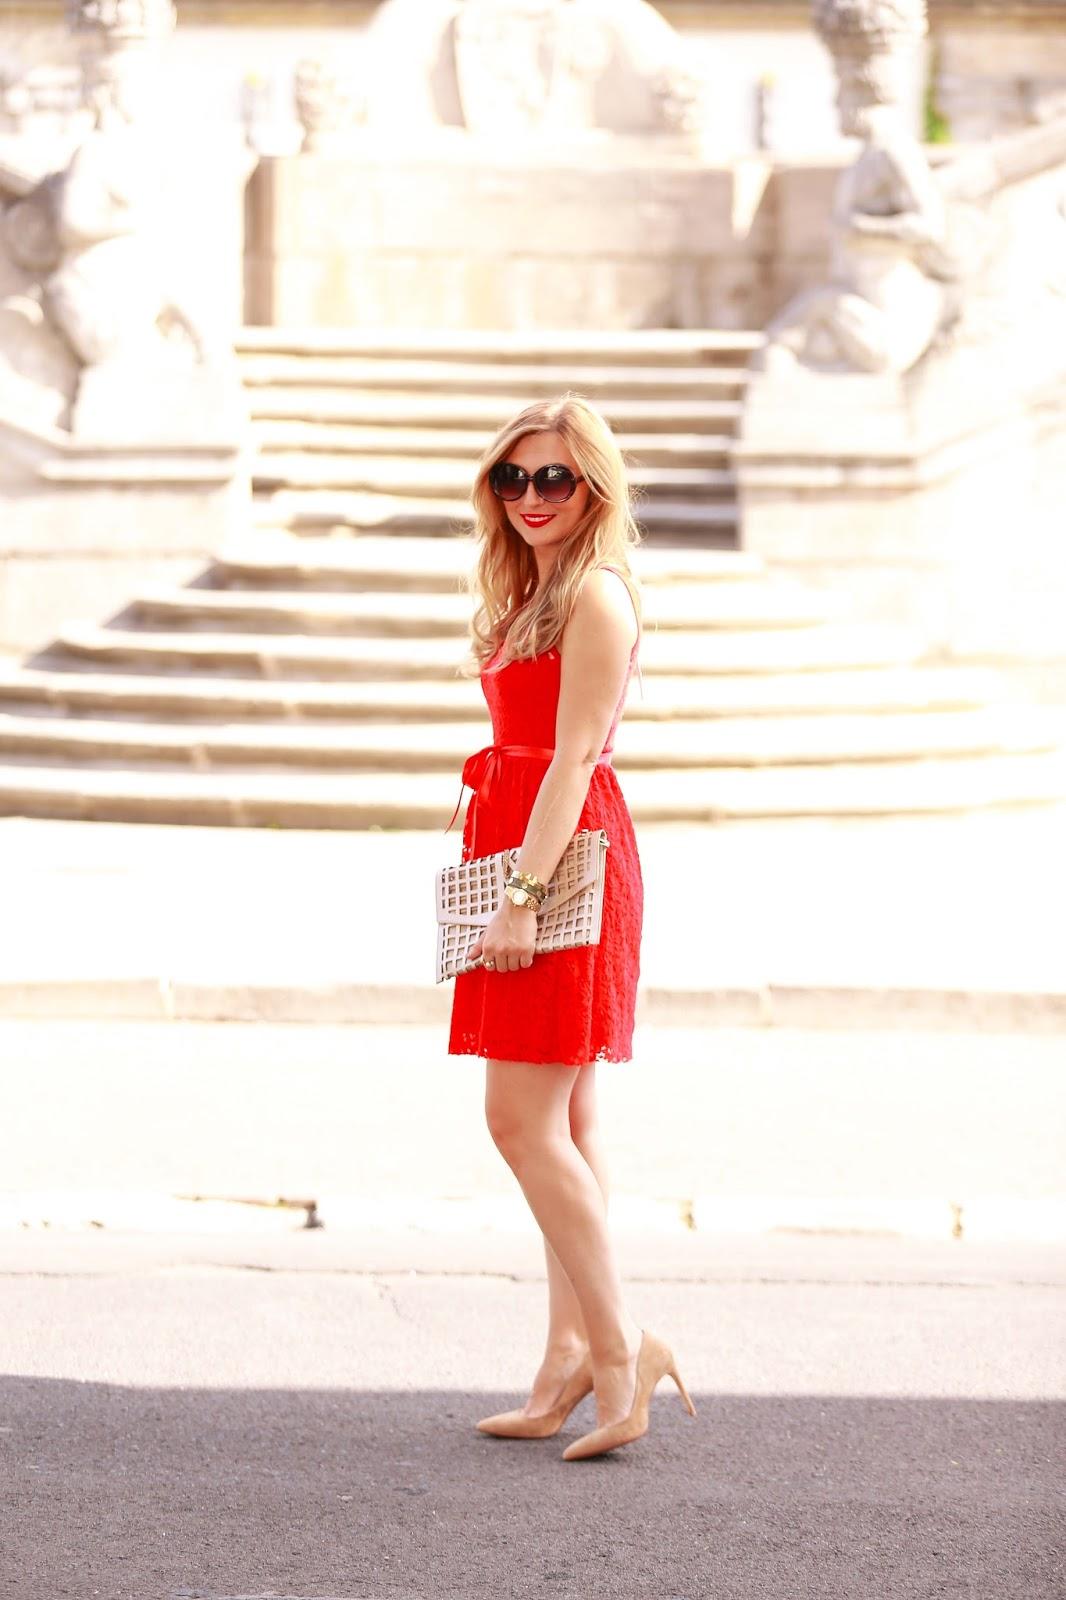 Fashionstylebyjohanna im Kleid